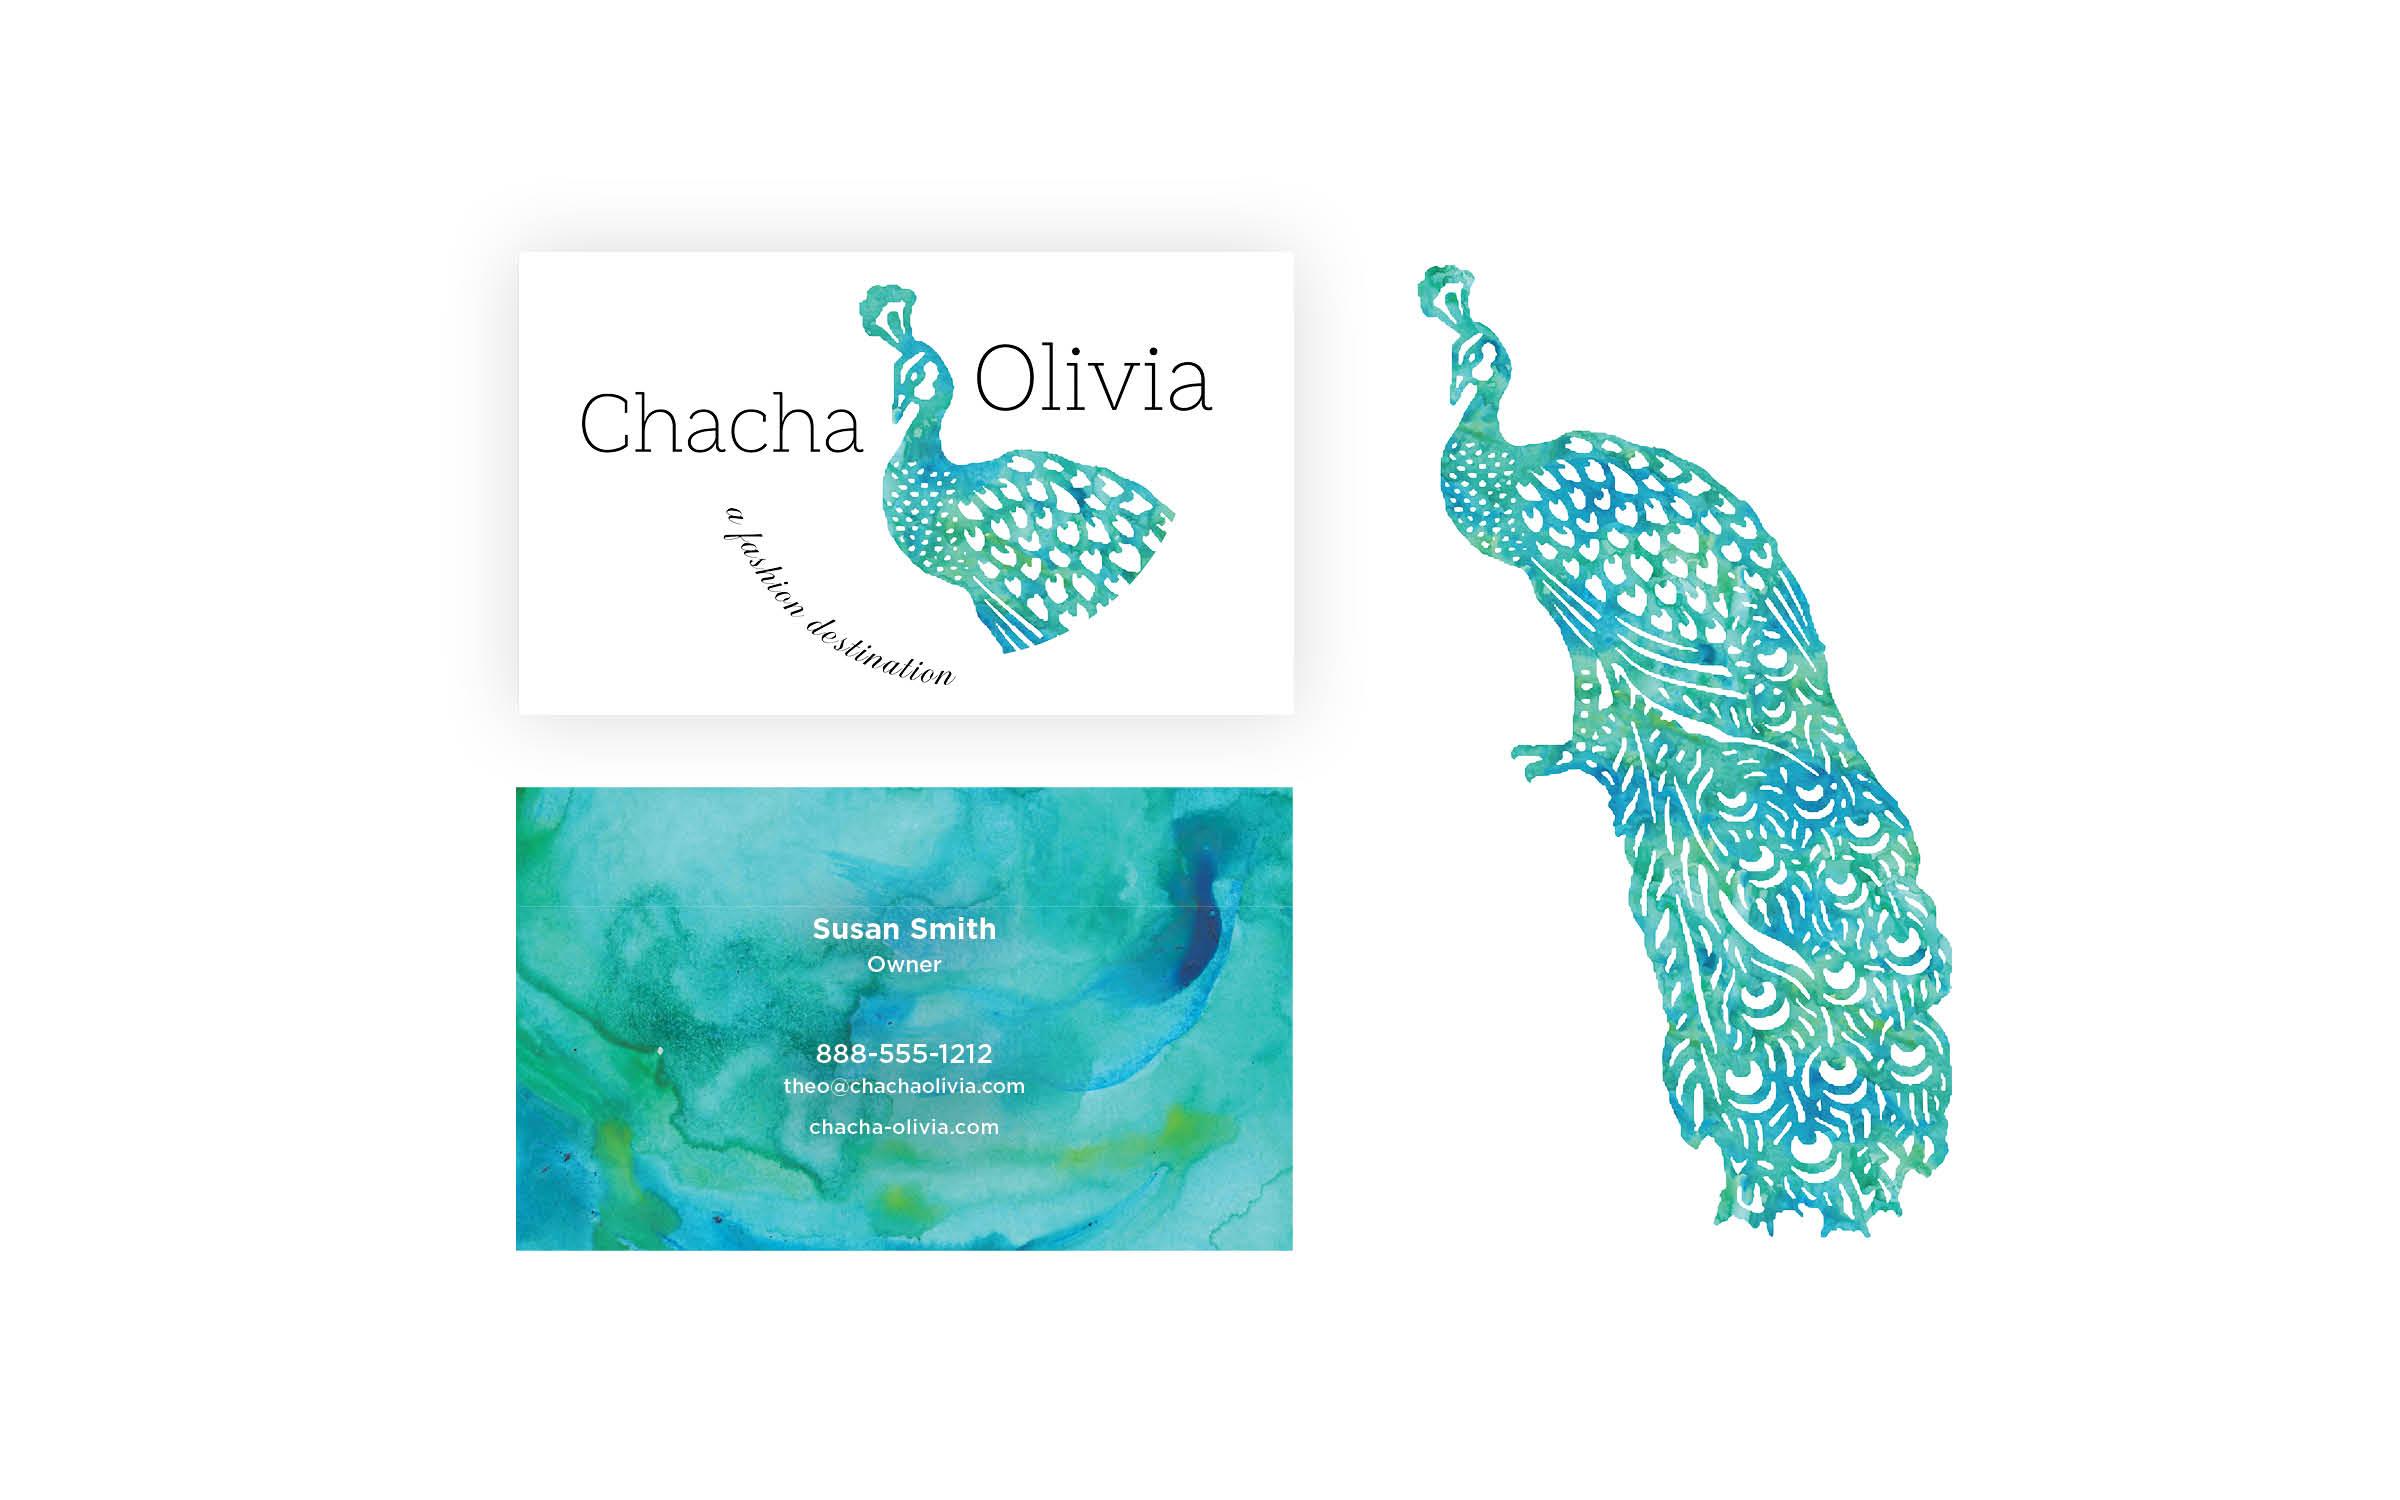 medium resolution of chacha olivia for squarespace4 jpg